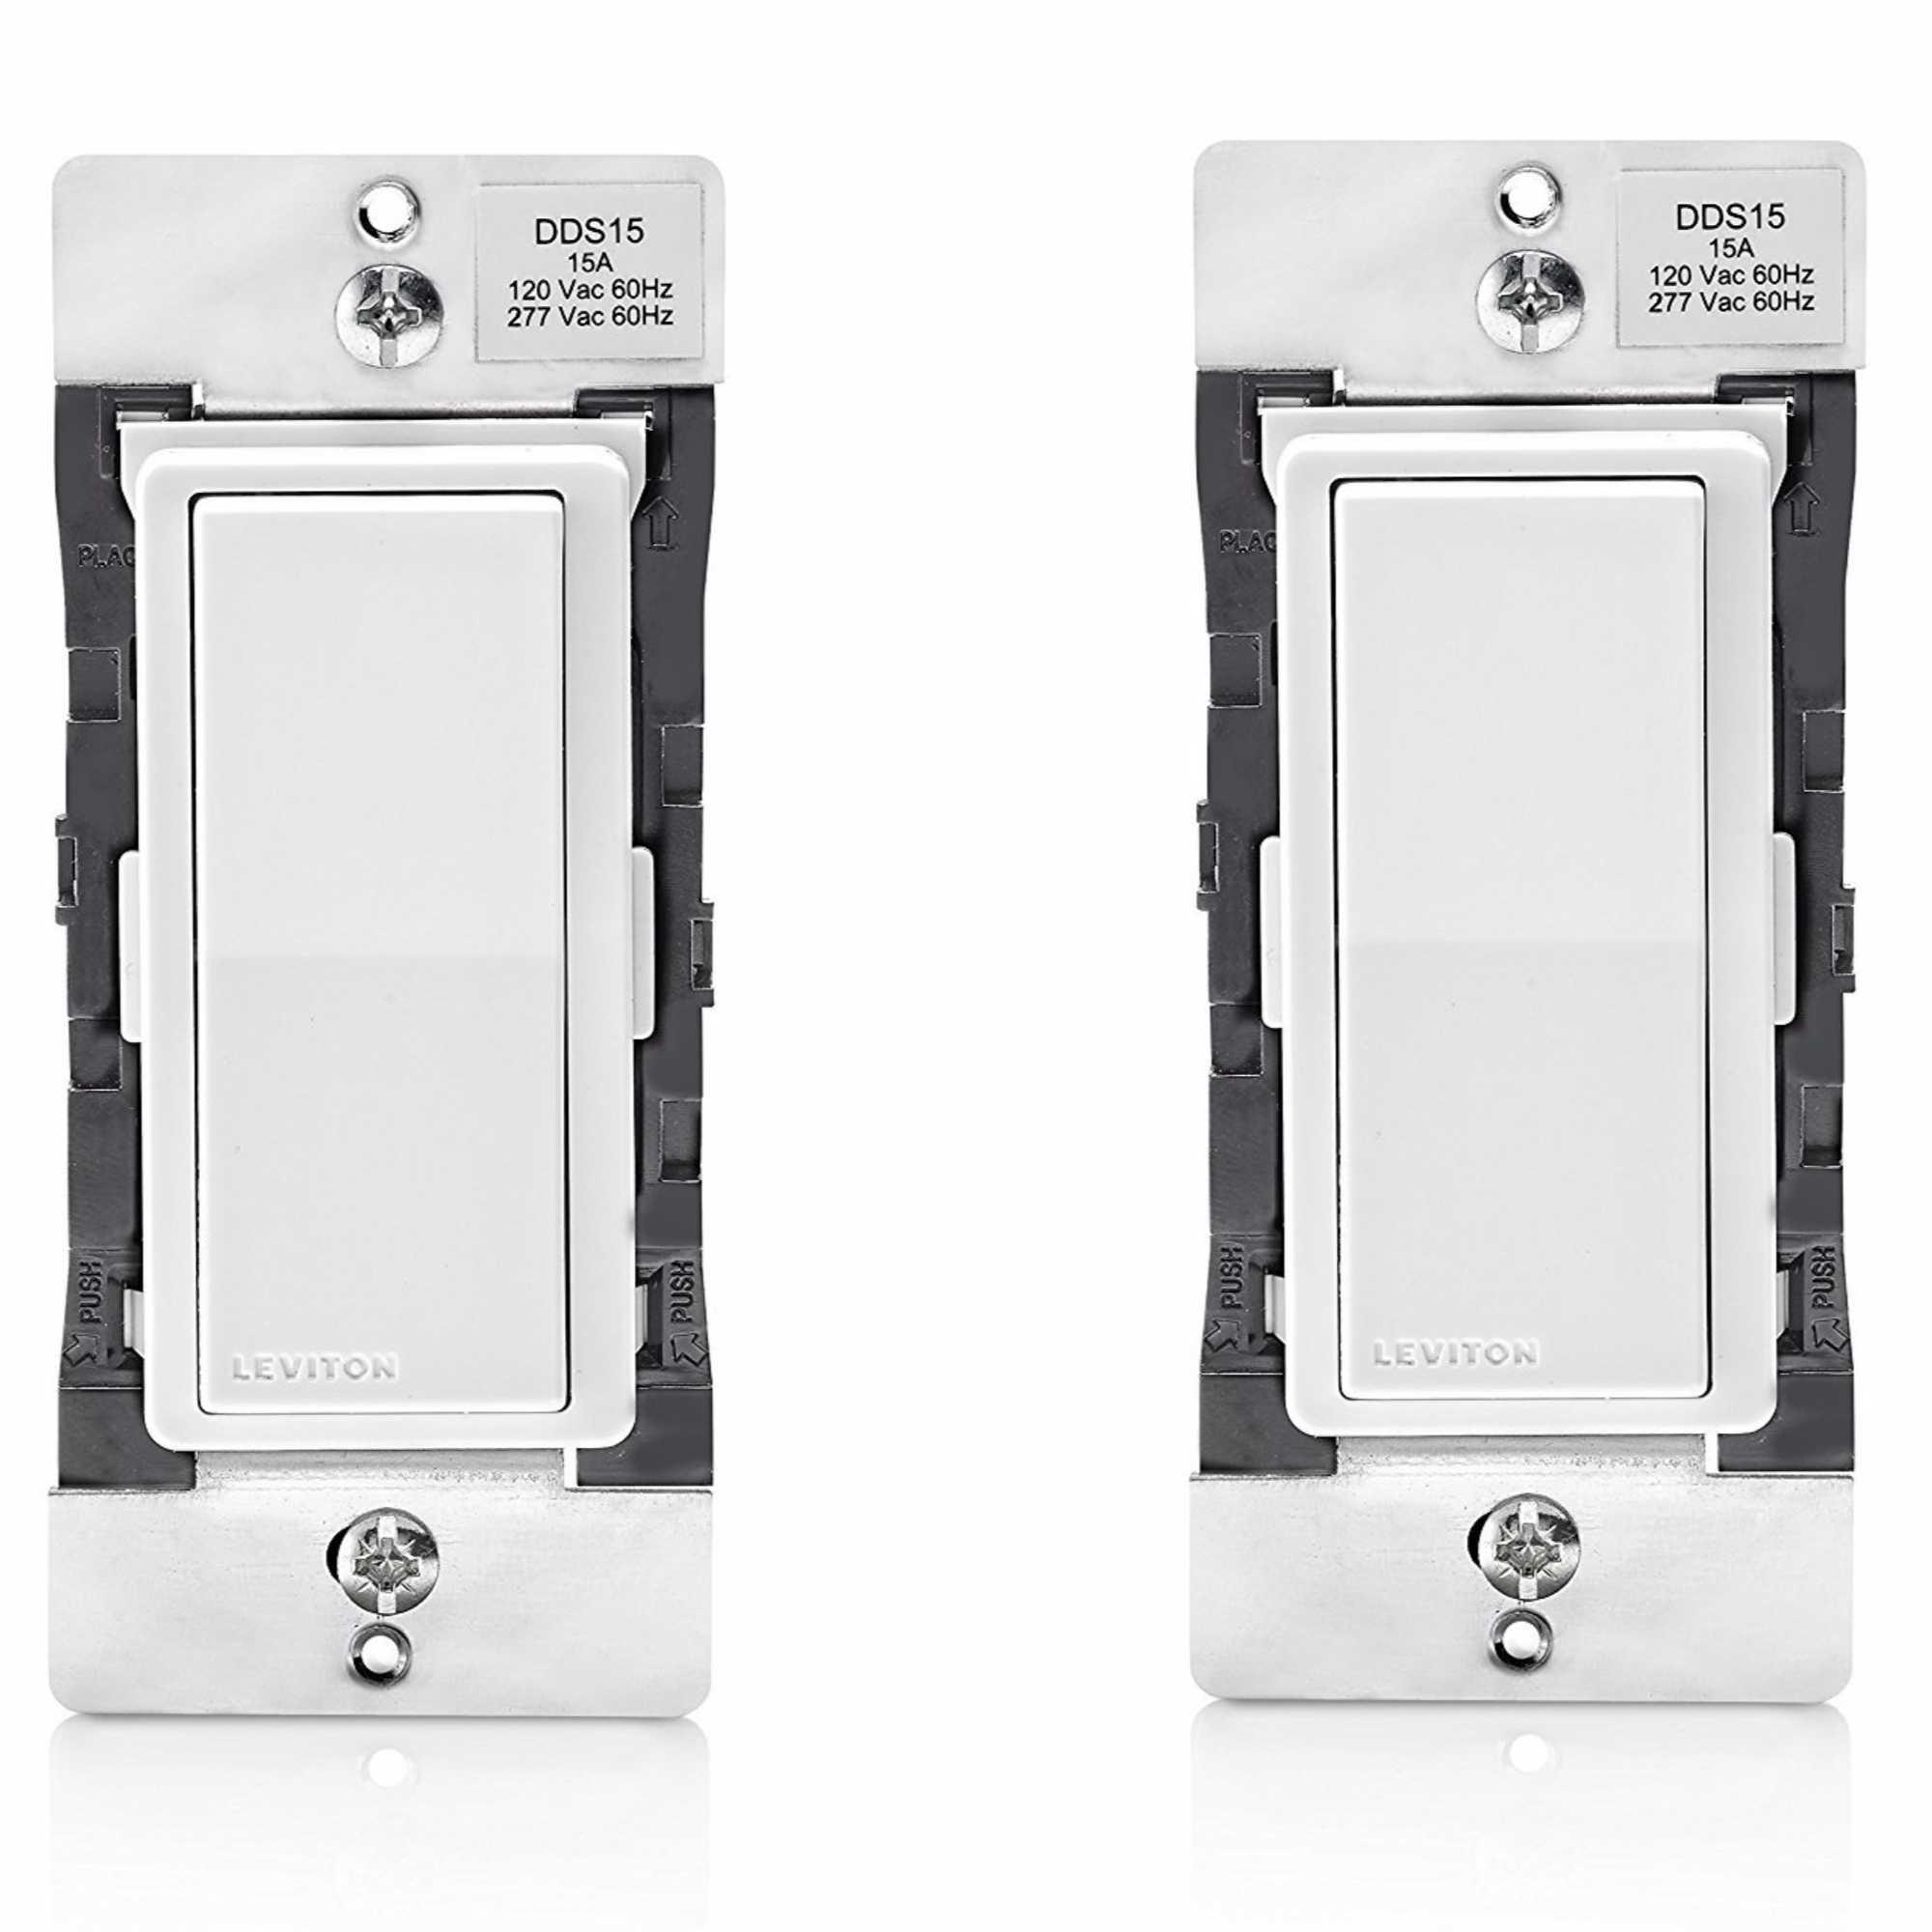 Leviton DDS15-BDZ 15 Amp Dual Voltage 120/277VAC Decora Digital Switch (2 Pack)